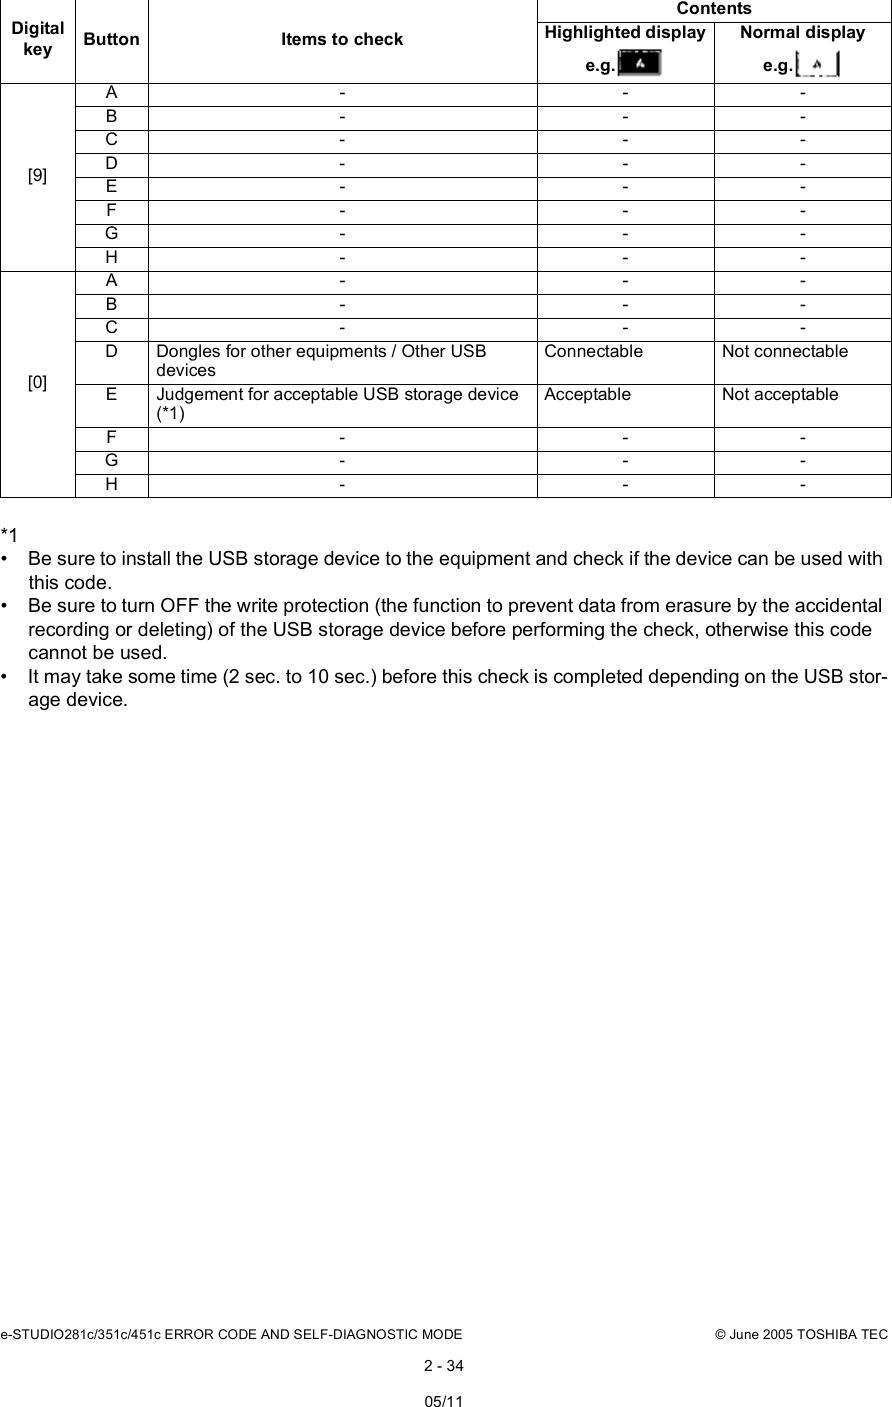 Toshiba Printer 281C Troubleshooting FC 451C_SH_EN_0004